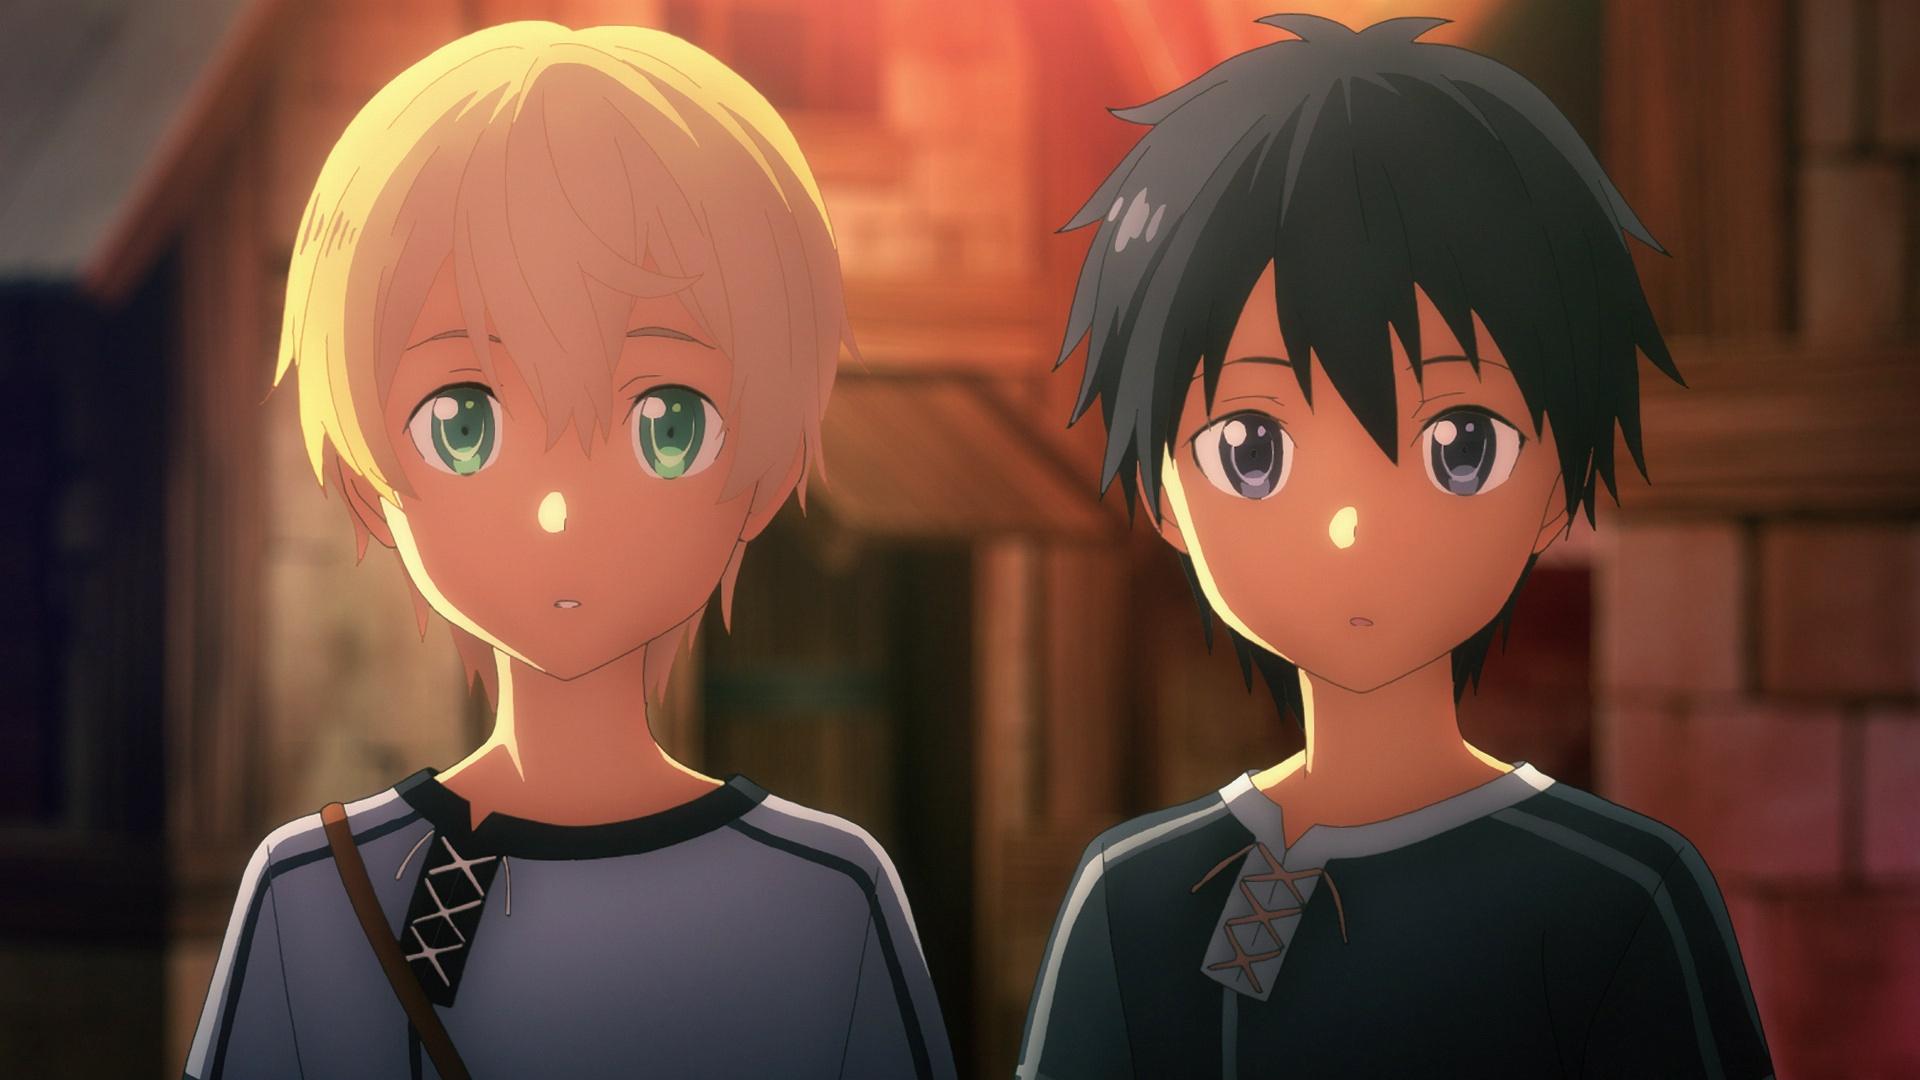 Watch Sword Art Online Season 3 Episode 1 Sub & Dub | Anime